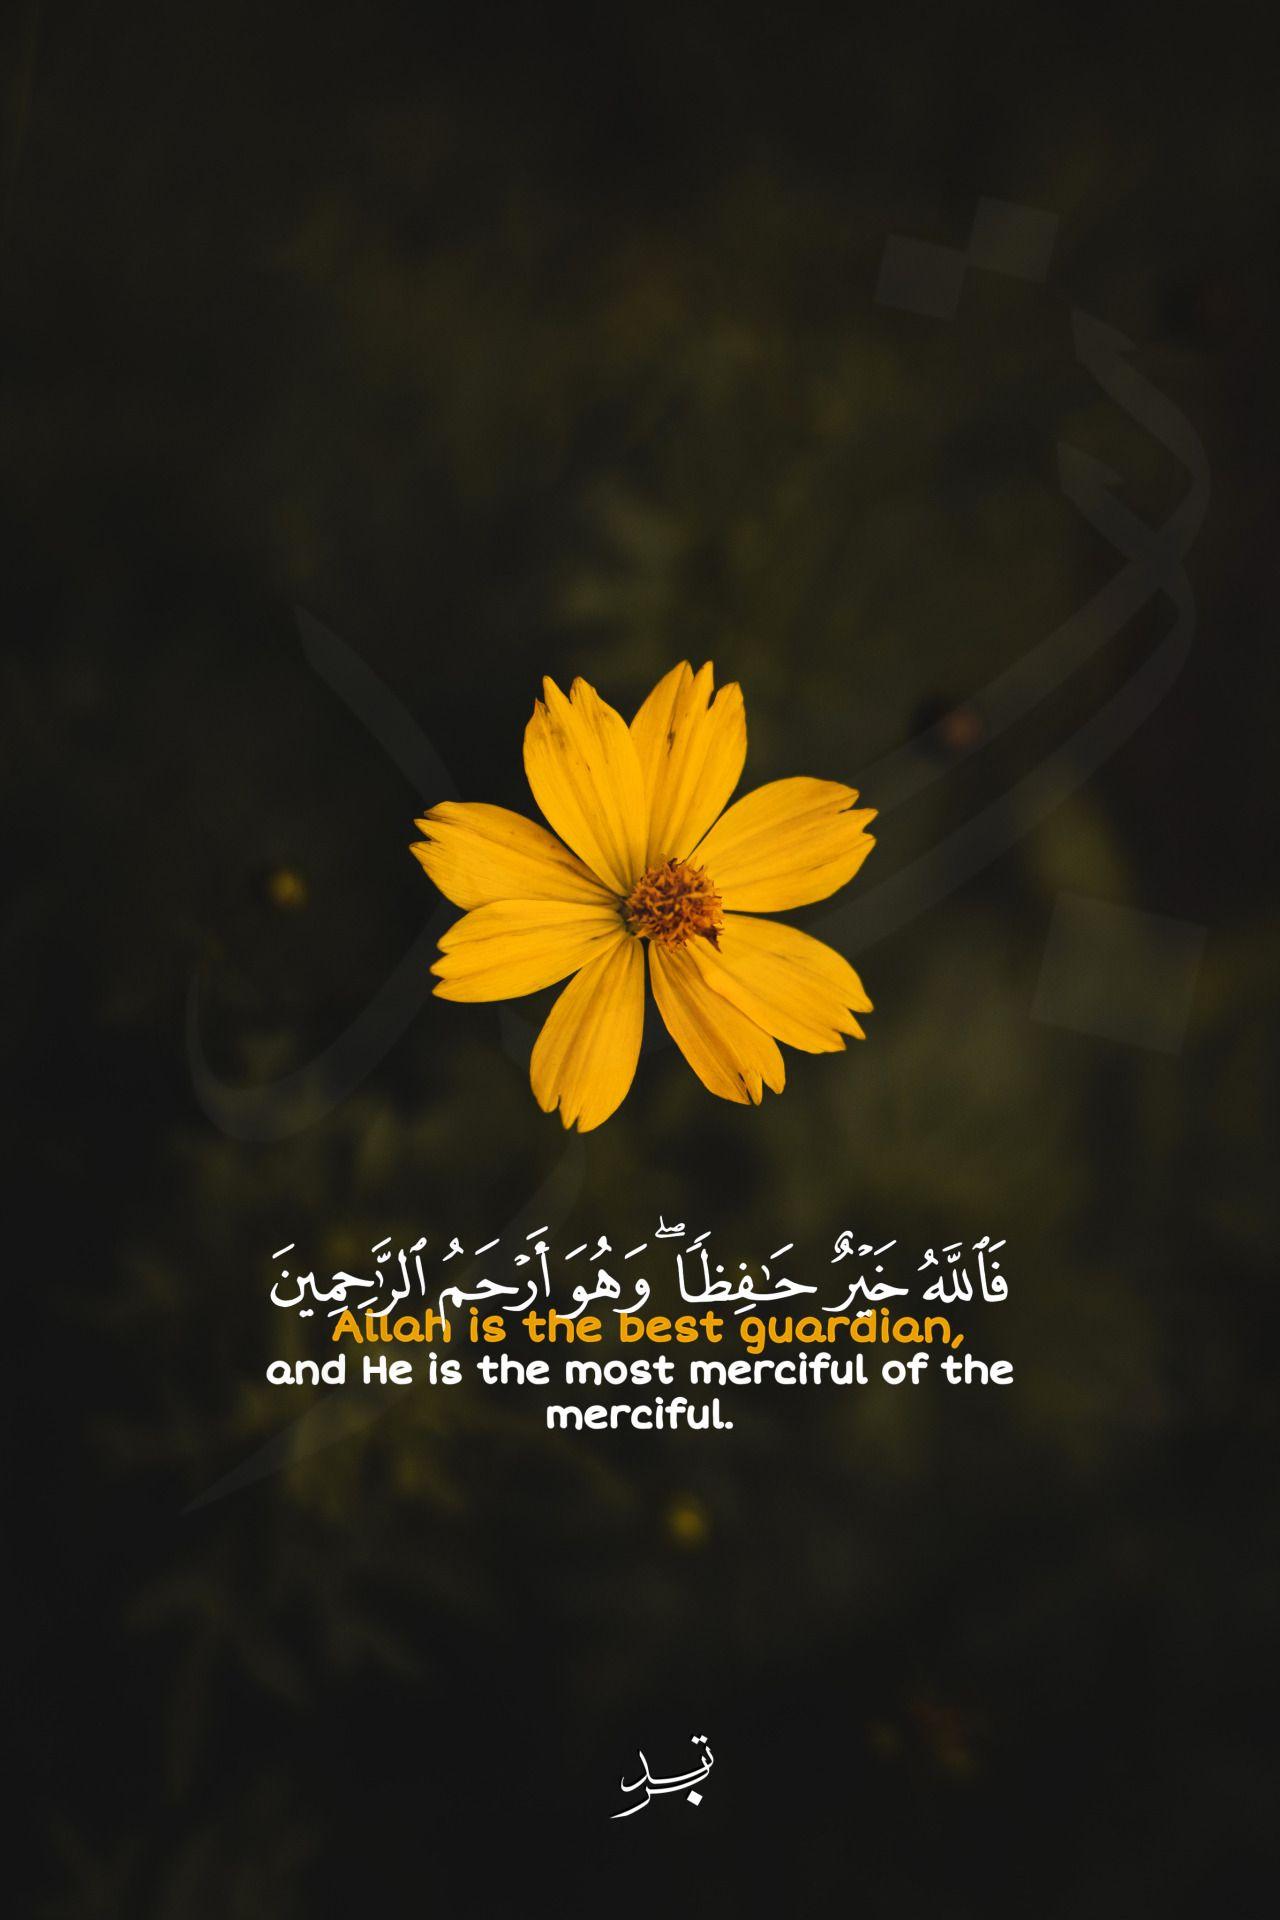 تدبر ت س ب ح ل ه الس م او ات الس ب ع و ال أ ر ض Quran Quotes Love Quran Quotes Inspirational Beautiful Quran Quotes